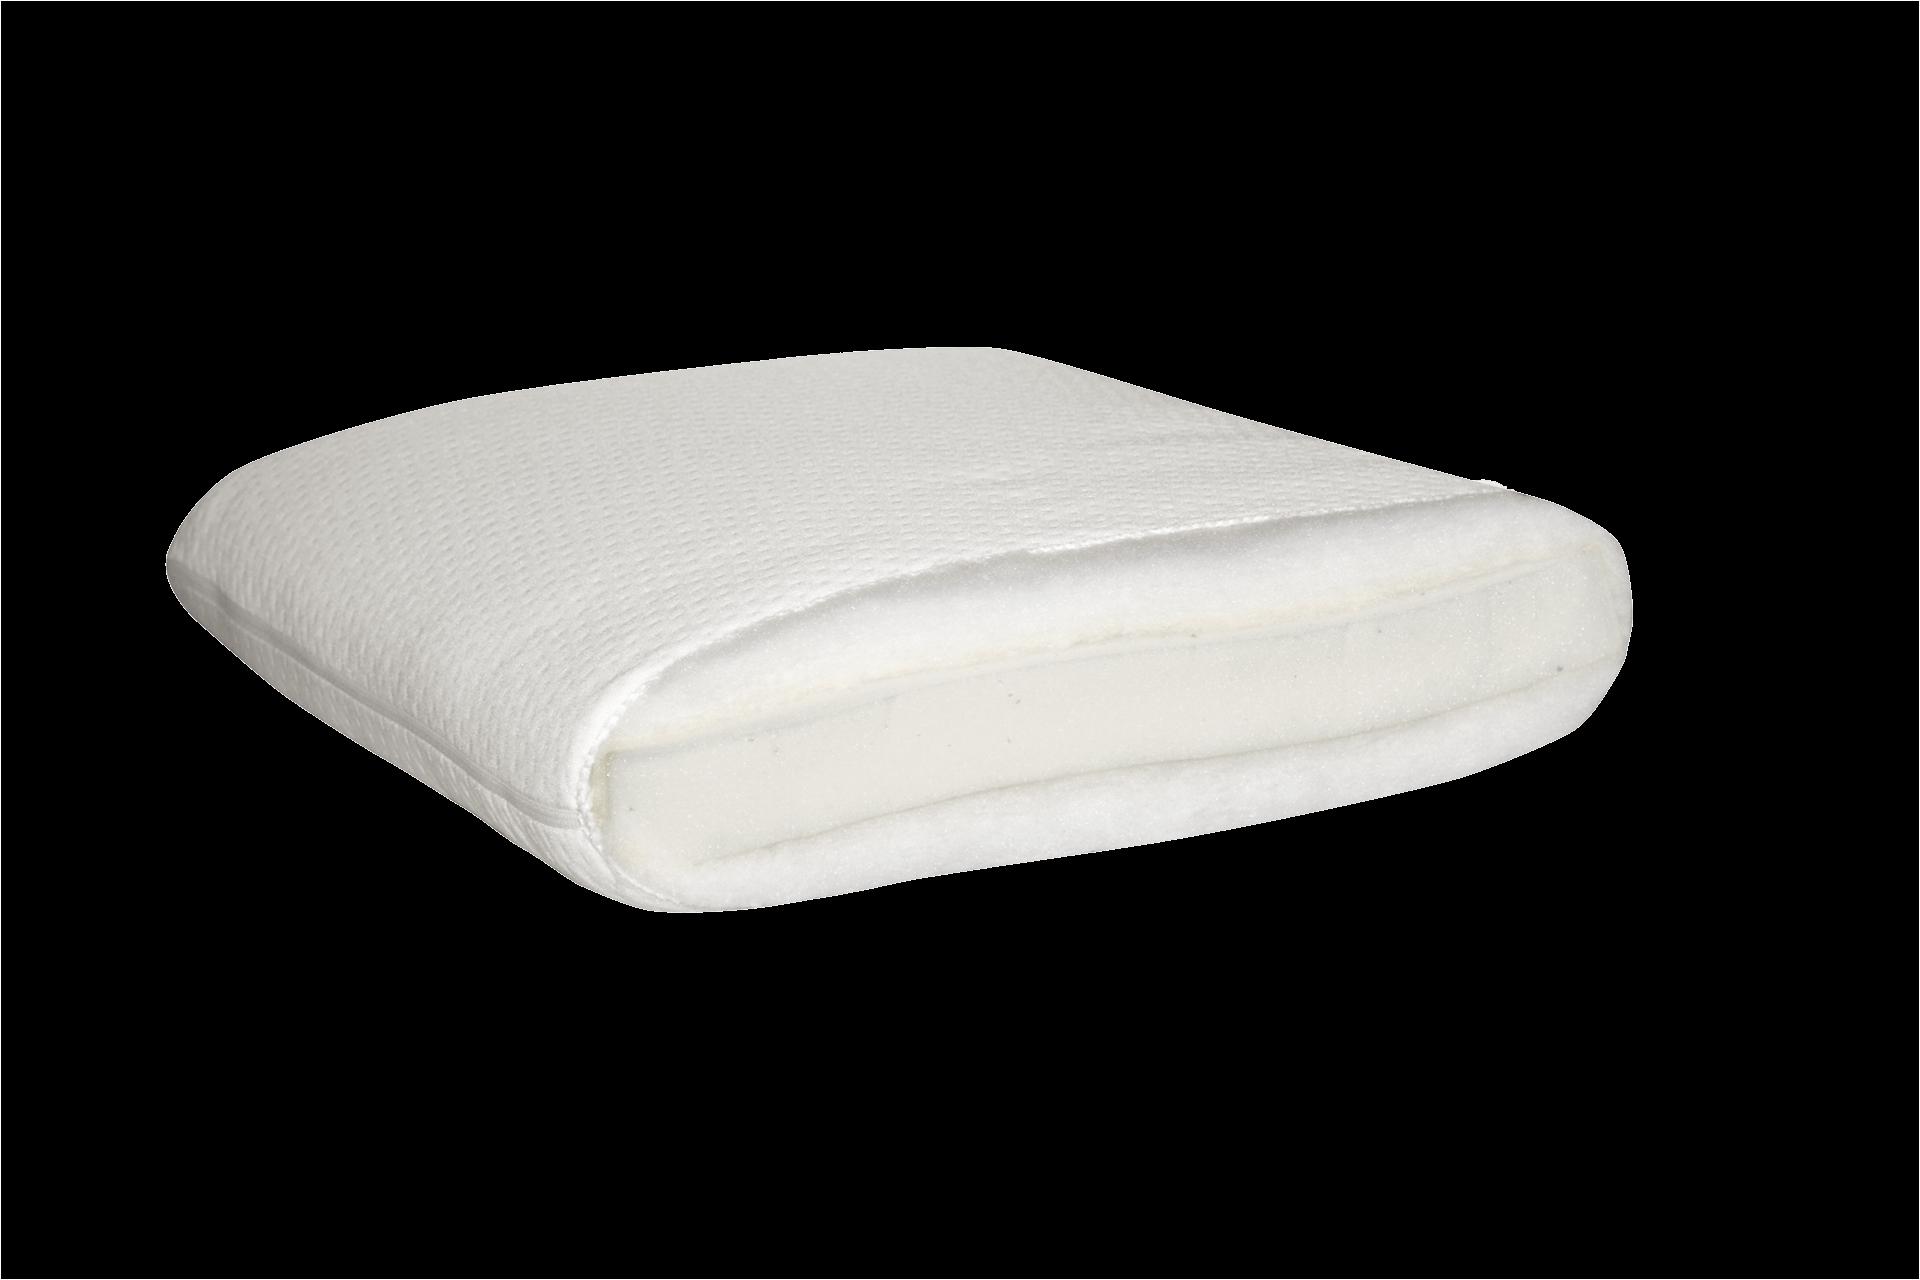 Kamjo topper for the Smart Collection: Medilux fresh comfort